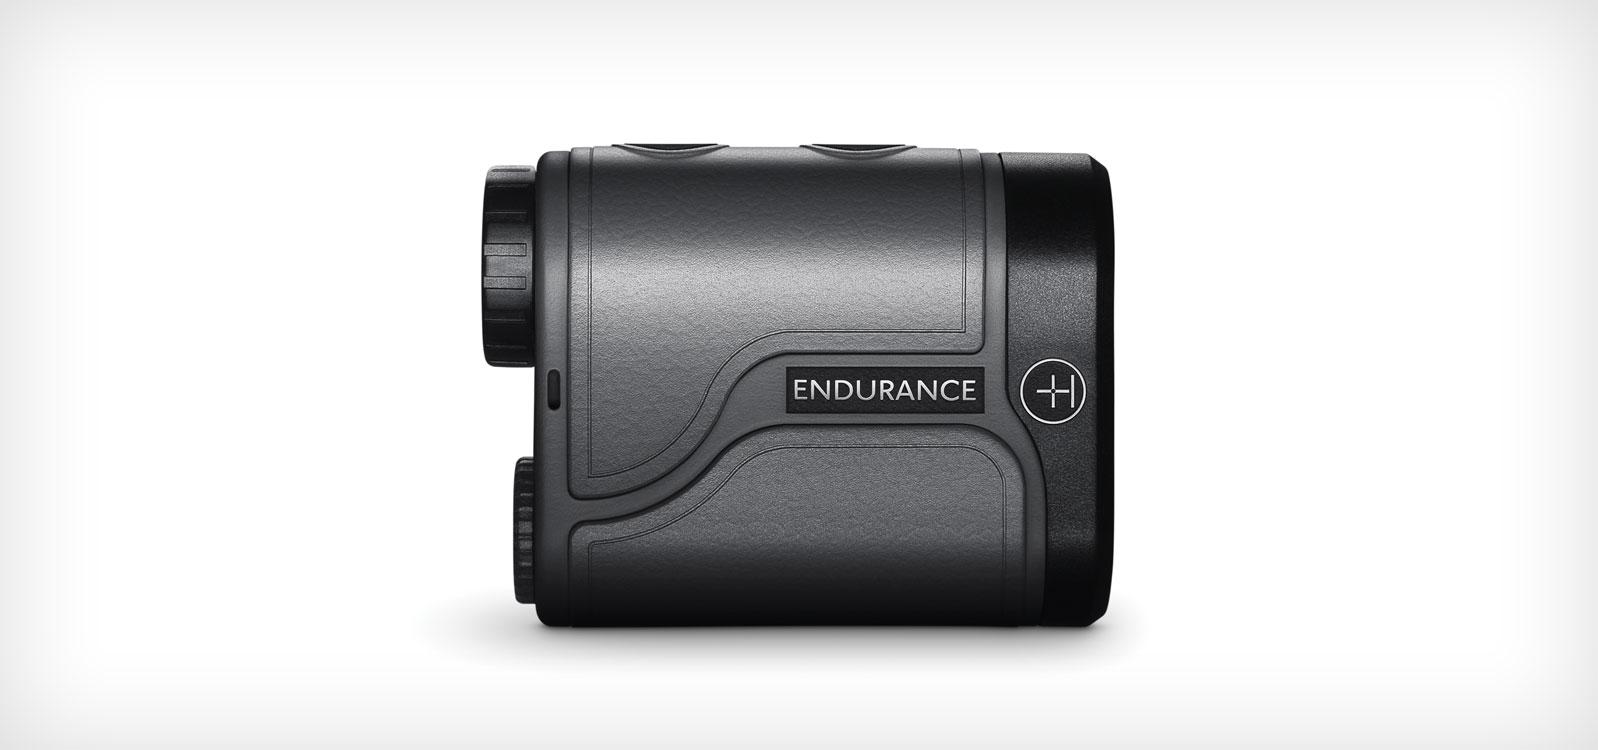 Hawke launch The New Endurance Range Finder